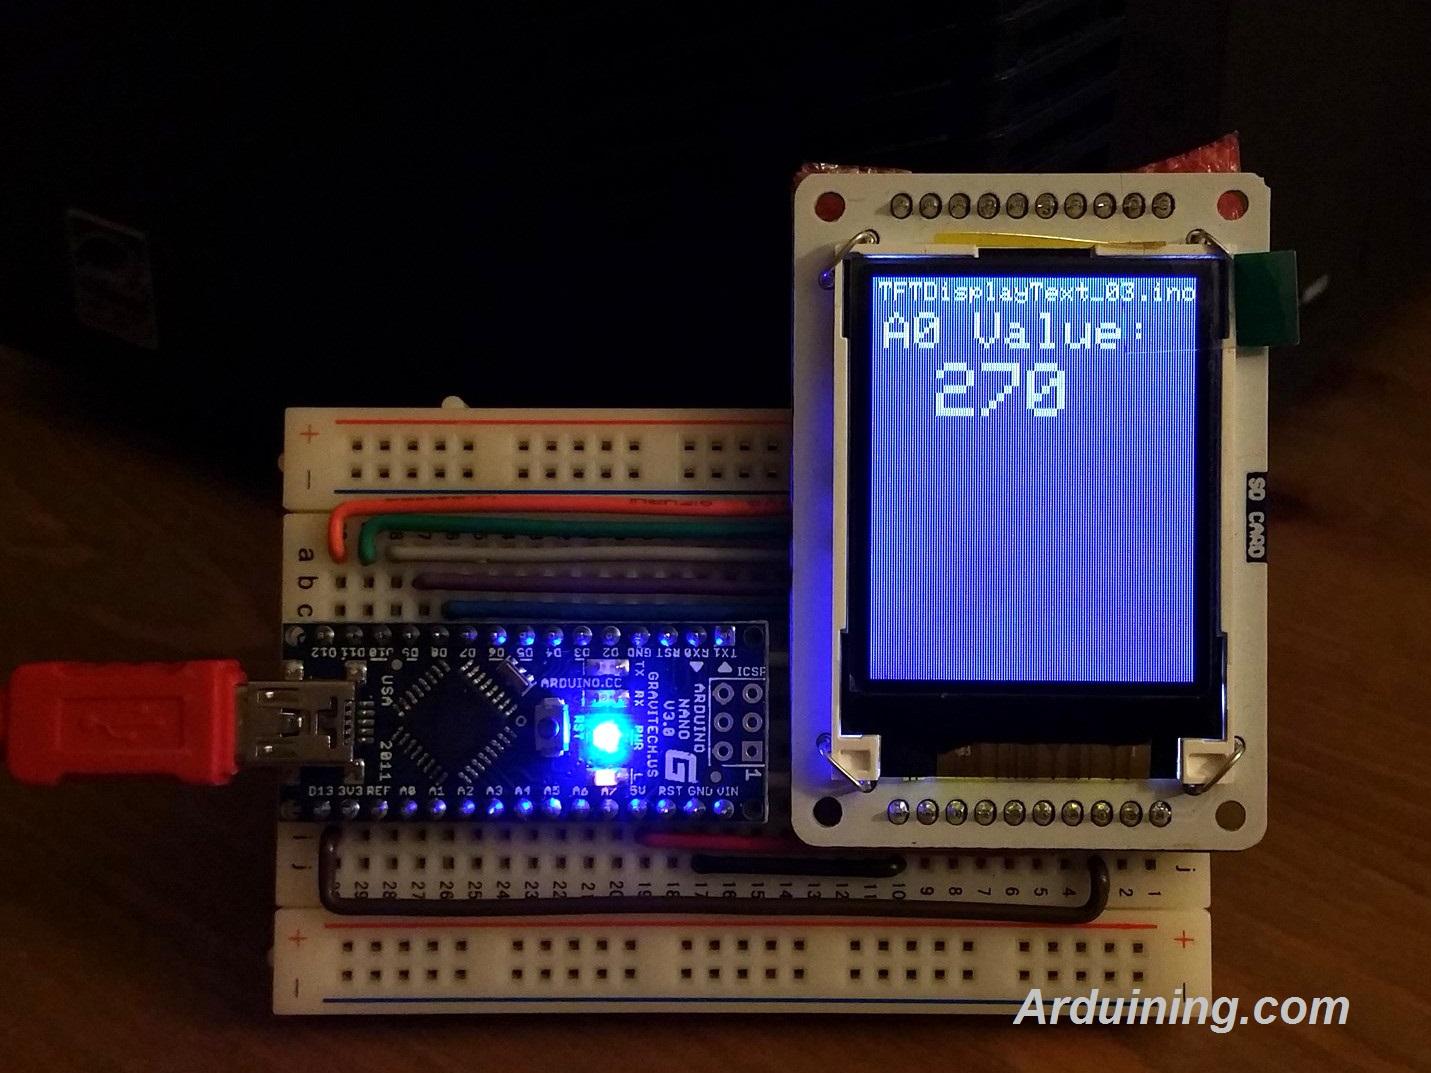 Wiring Tft Display To Arduino Nano  U2013 Arduining